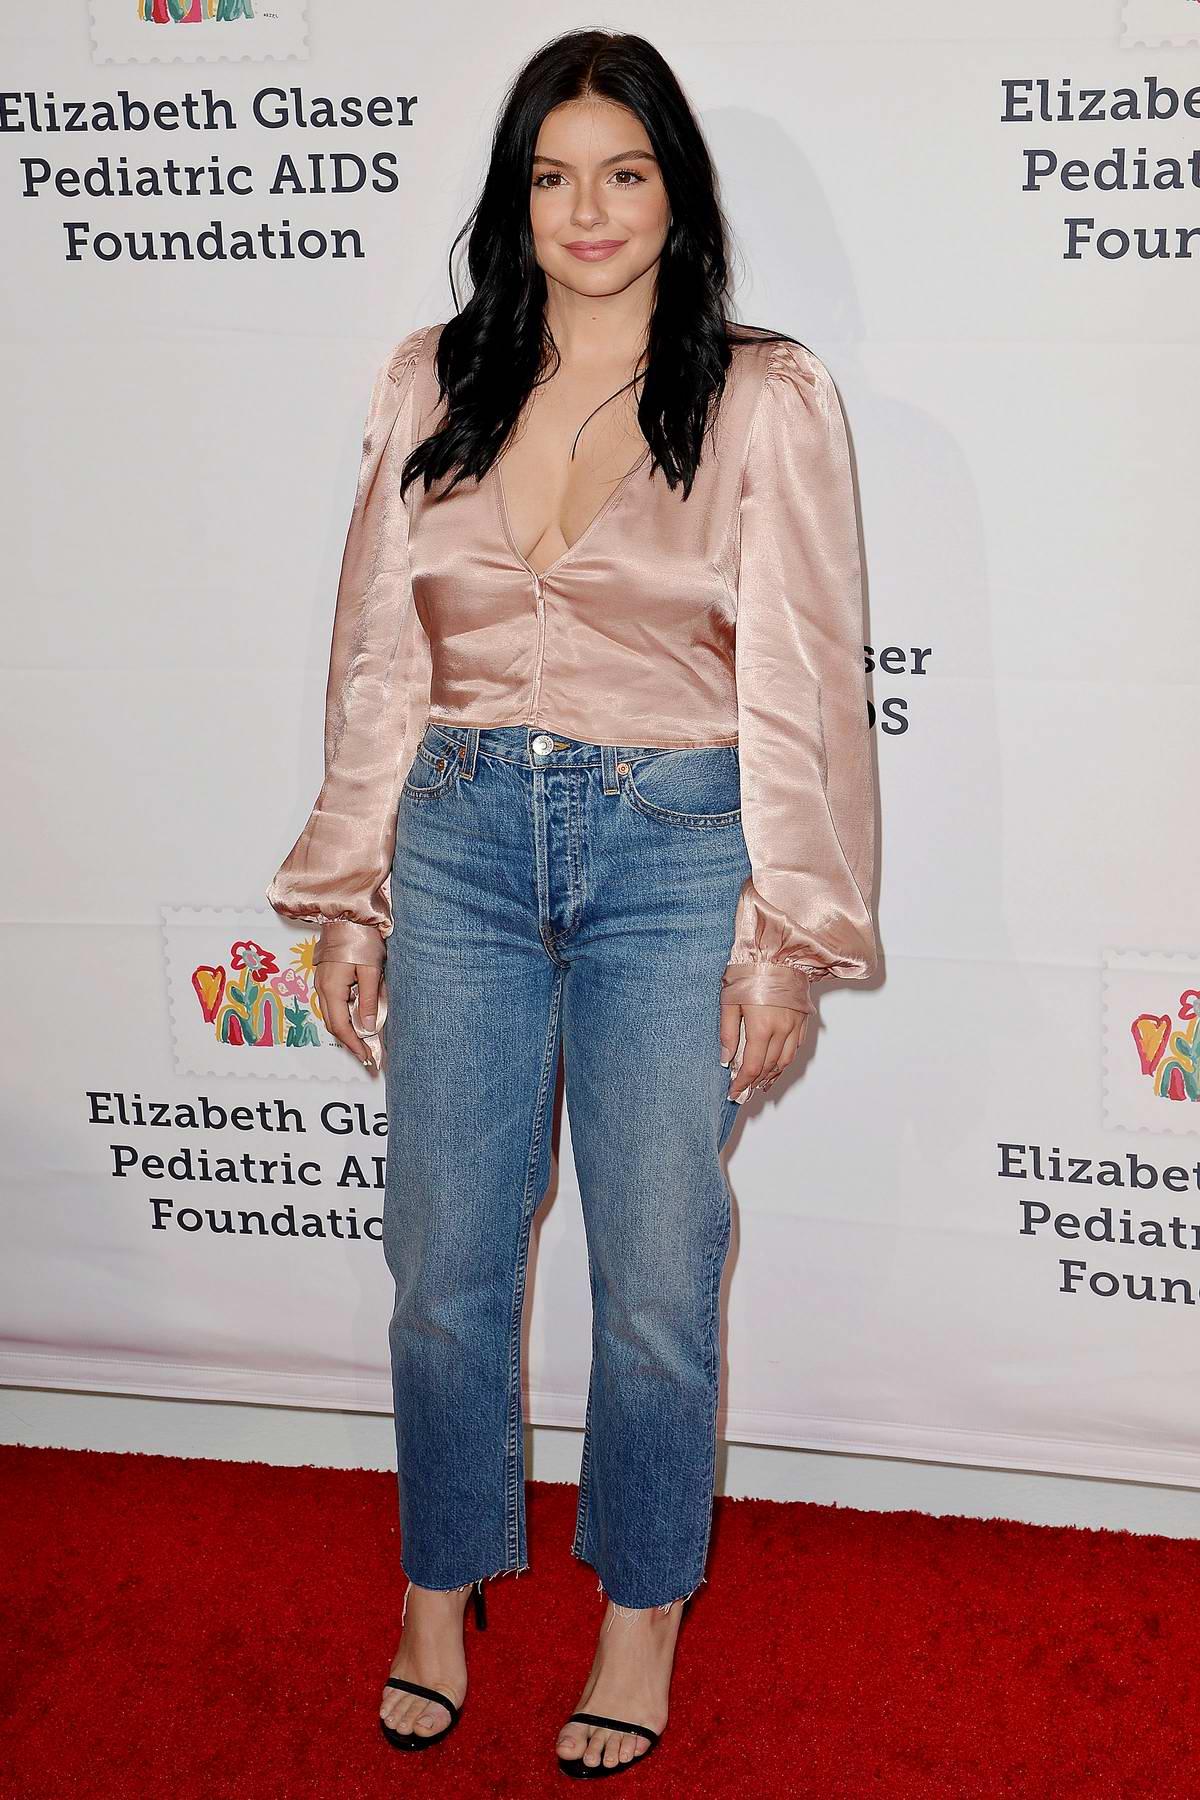 Ariel Winter attends Elizabeth Glaser Pediatric AIDS Foundation 30th Anniversary in Culver City, California